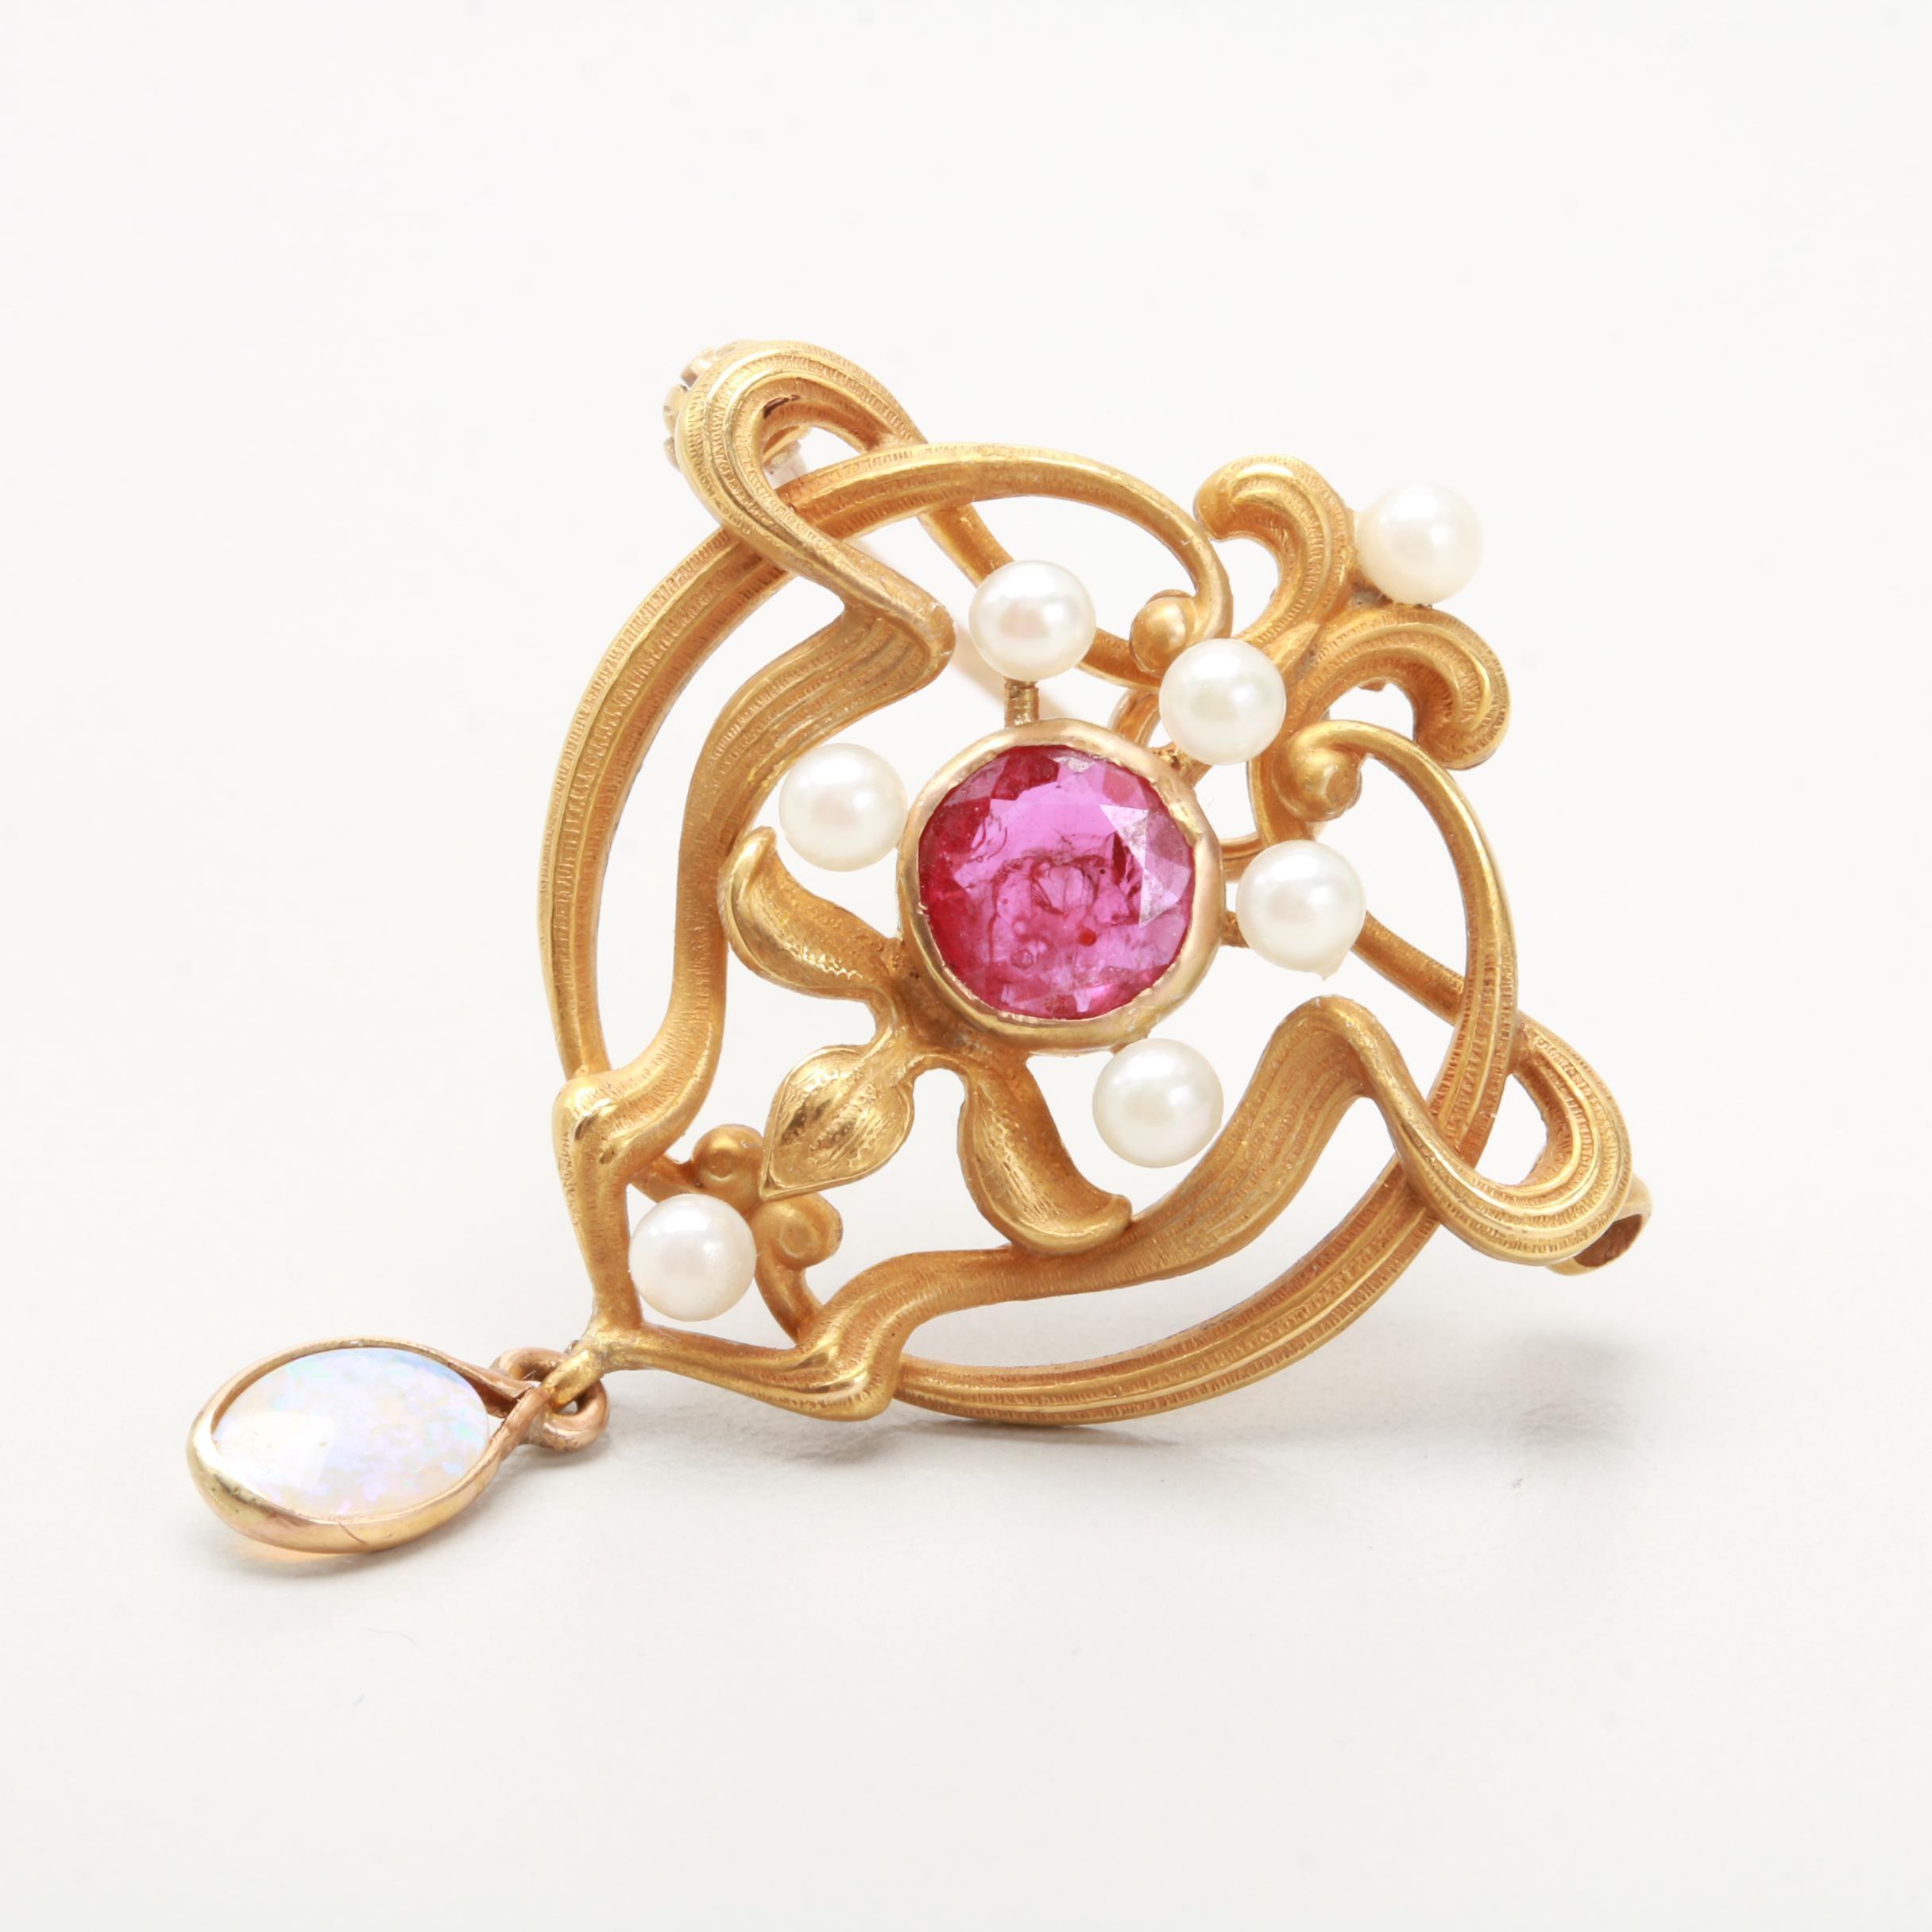 14K Yellow Gold Opal, Corundum and Cultured Pearl Art Nouveau Converter Brooch